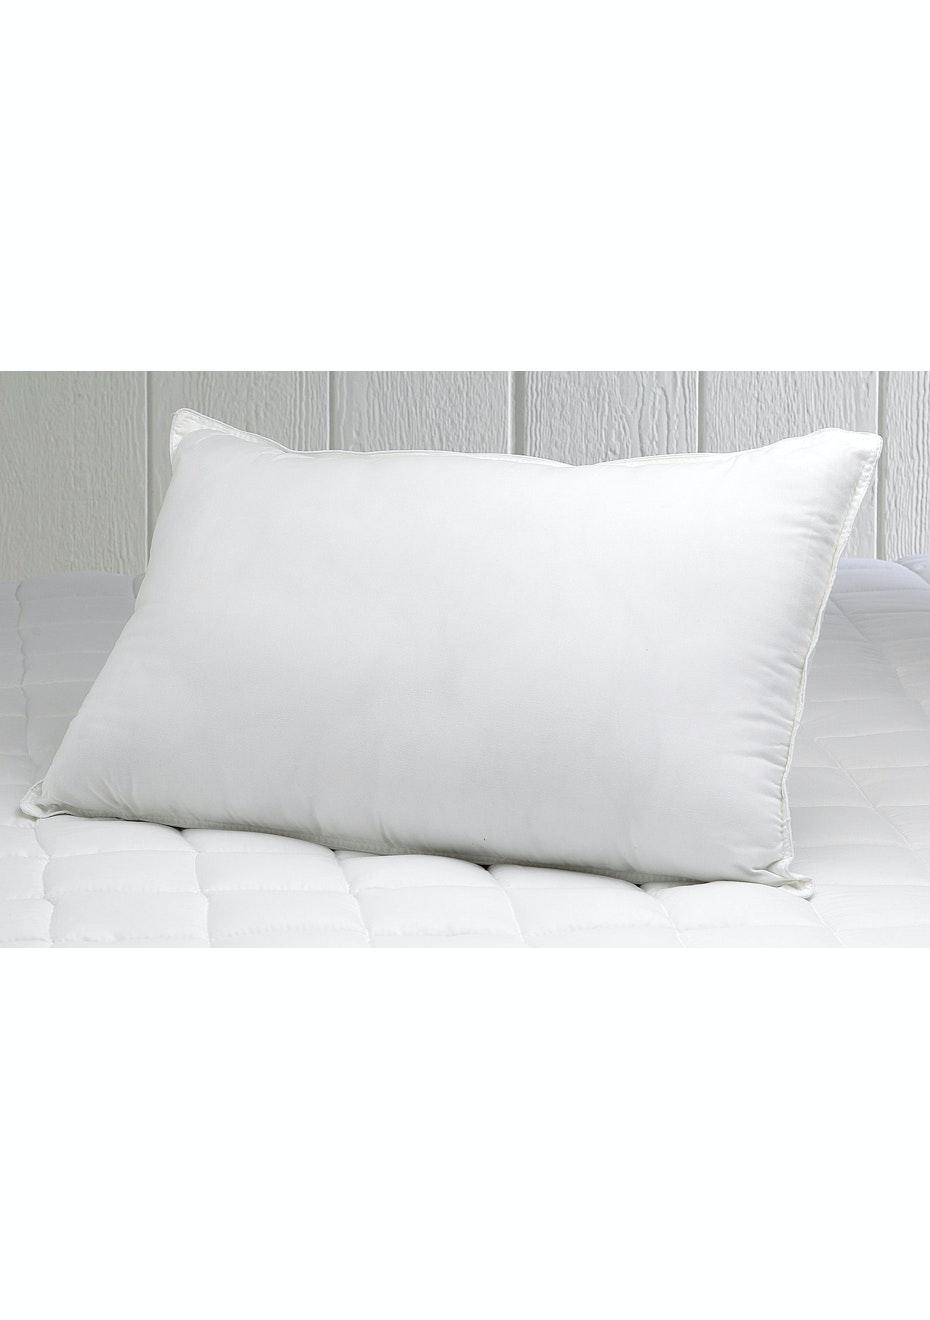 Luxury Microlush Pillow 900 gms - luxe loft